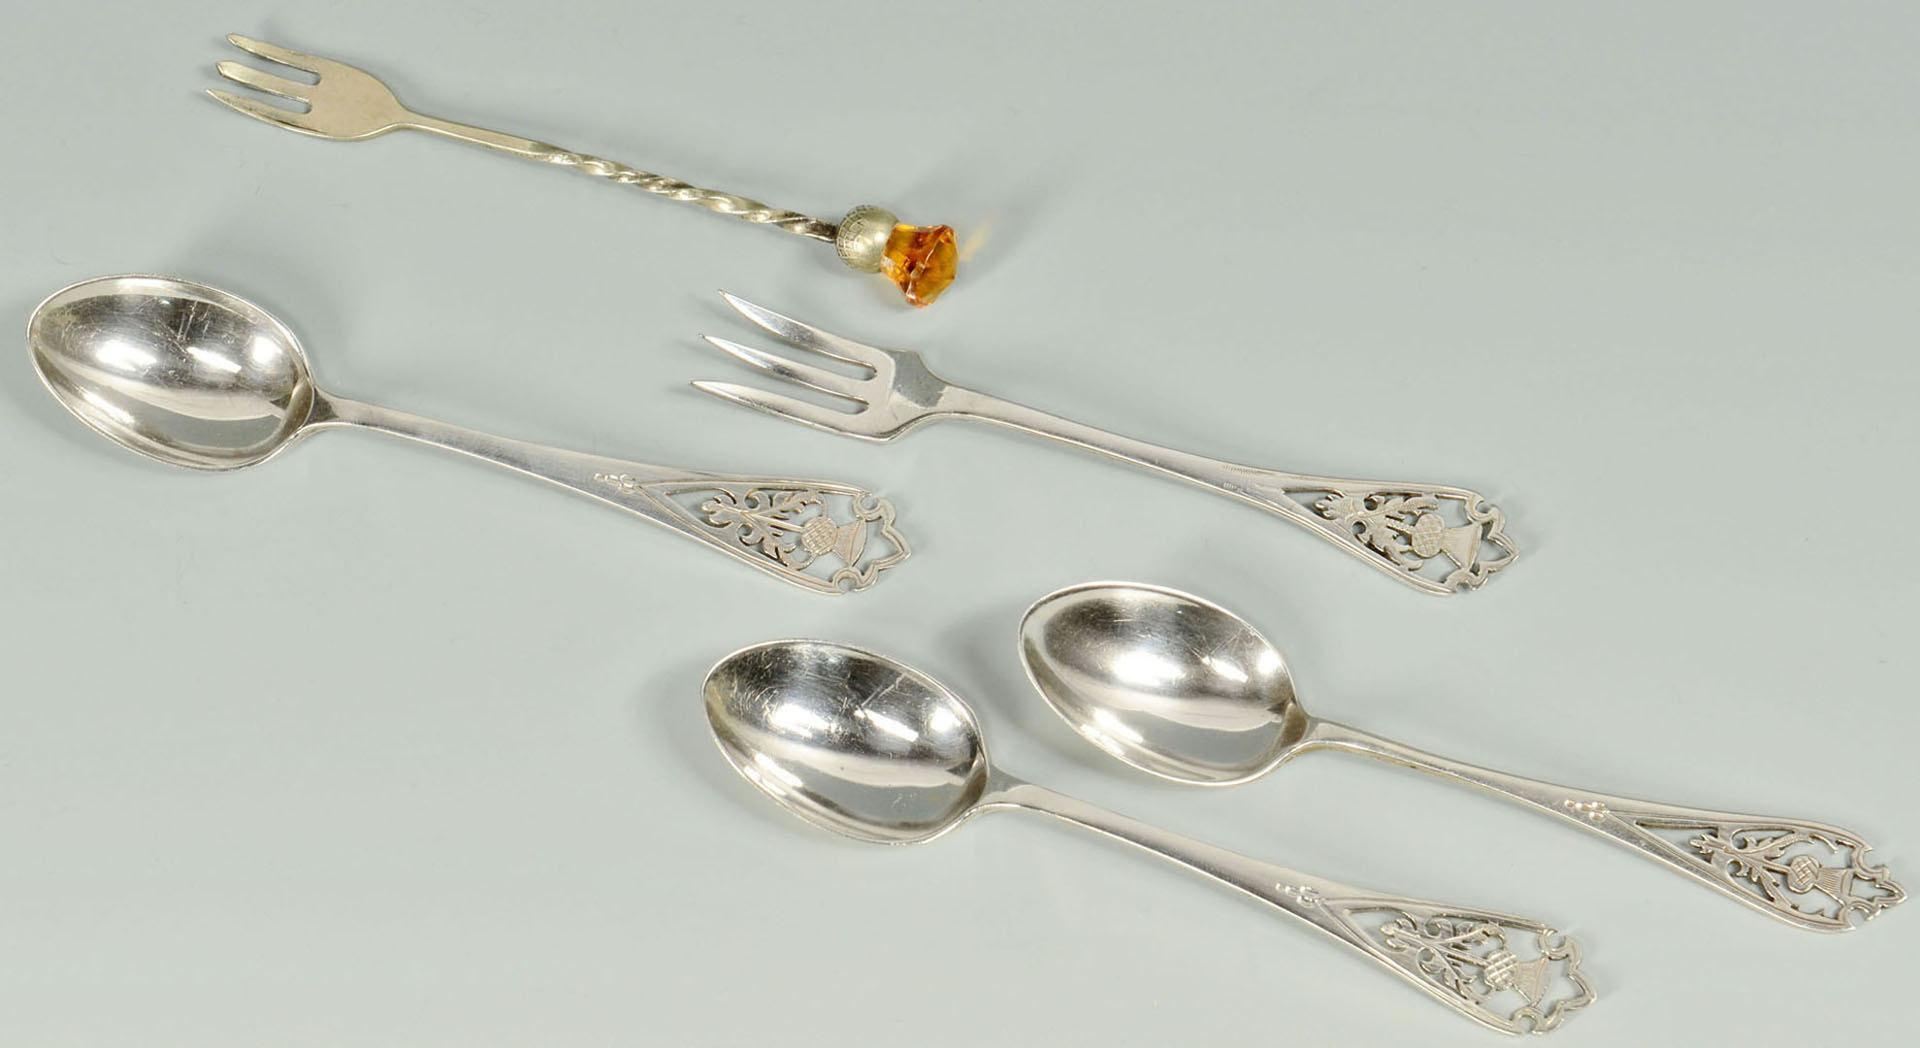 Lot 503: Scottish style Jewelry and Silverware